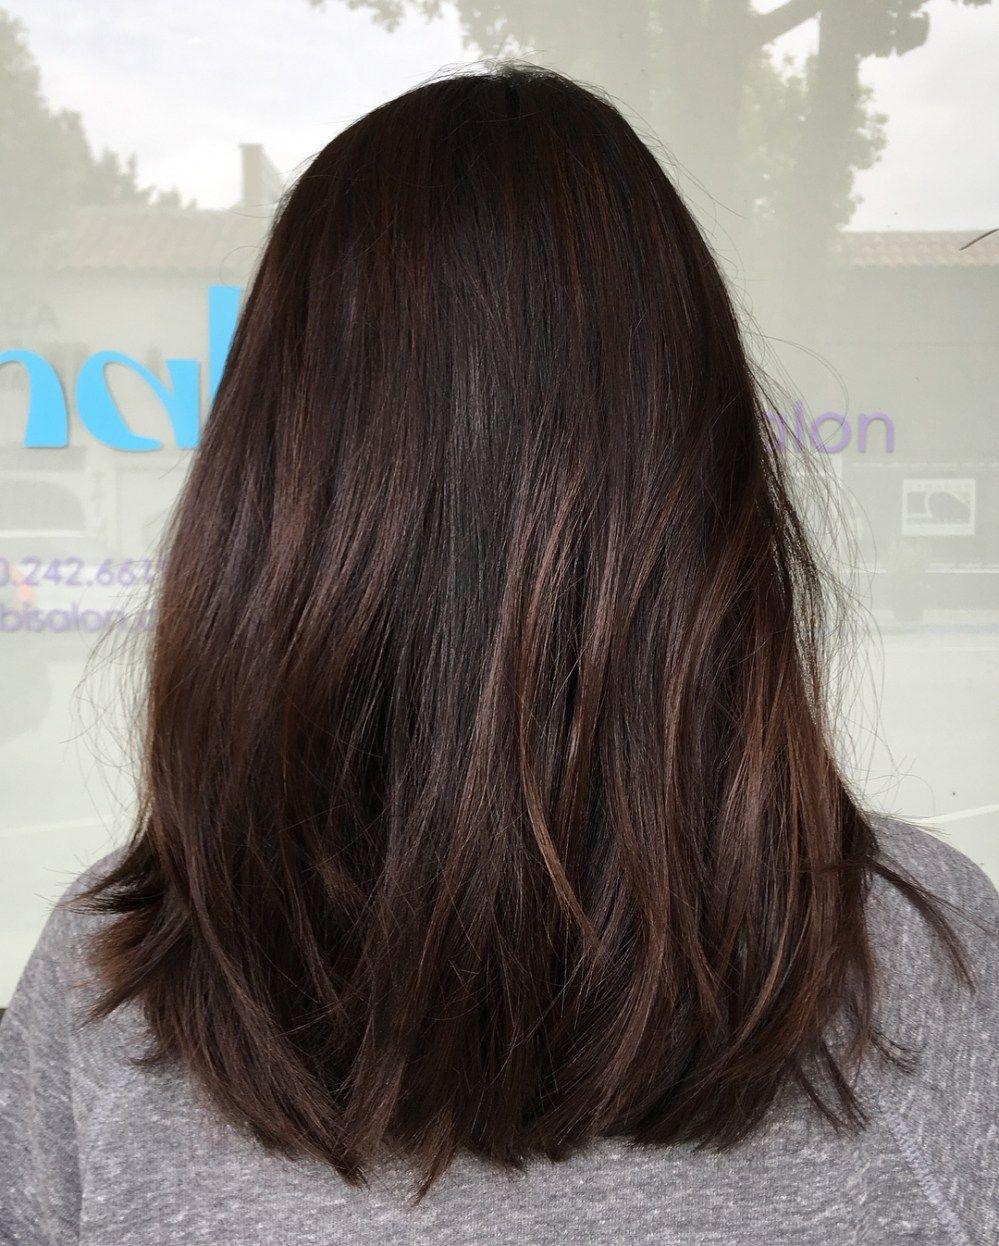 60 Hairstyles Featuring Dark Brown Hair With Highlights Brown Straight Hair Hair Styles Straight Brunette Hair